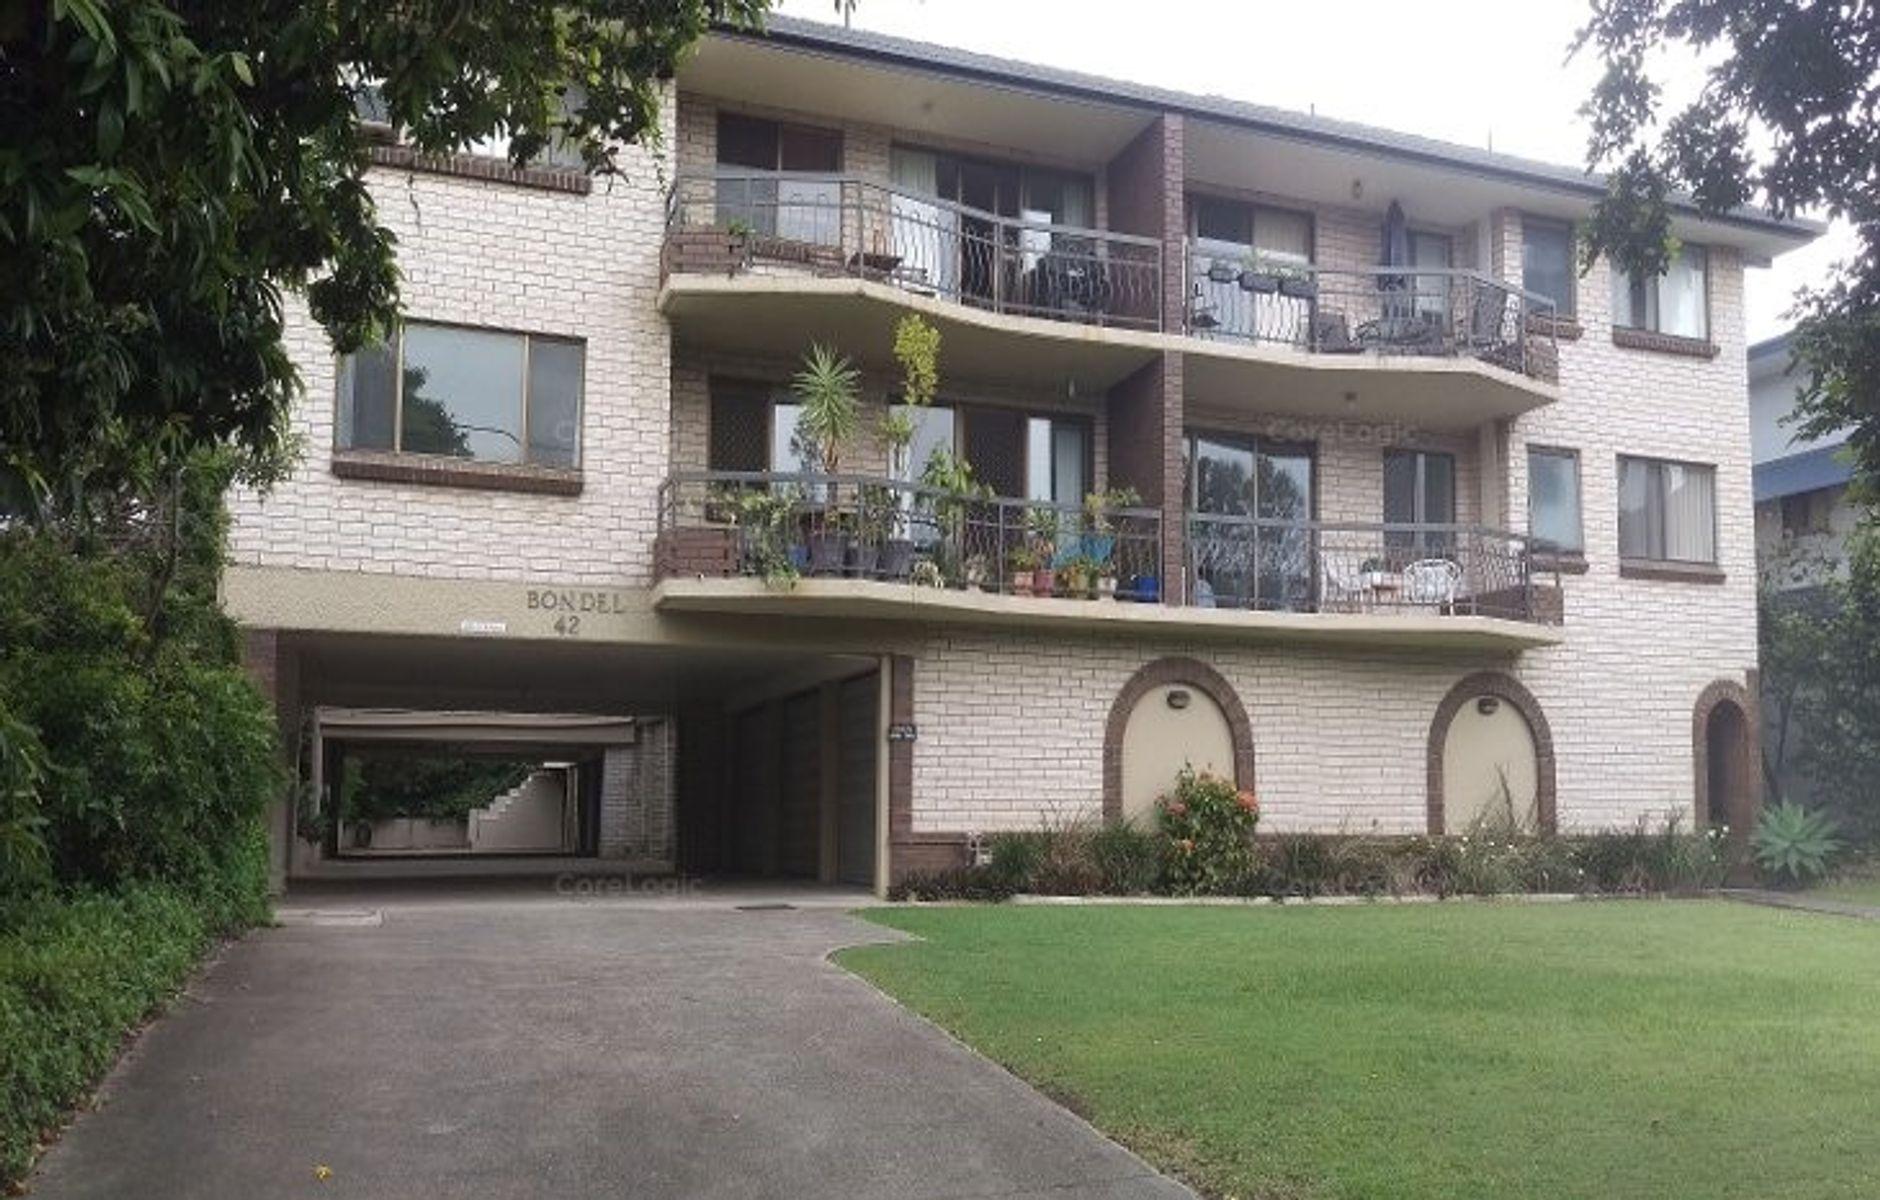 6/42 Bonney Avenue, Clayfield, QLD 4011